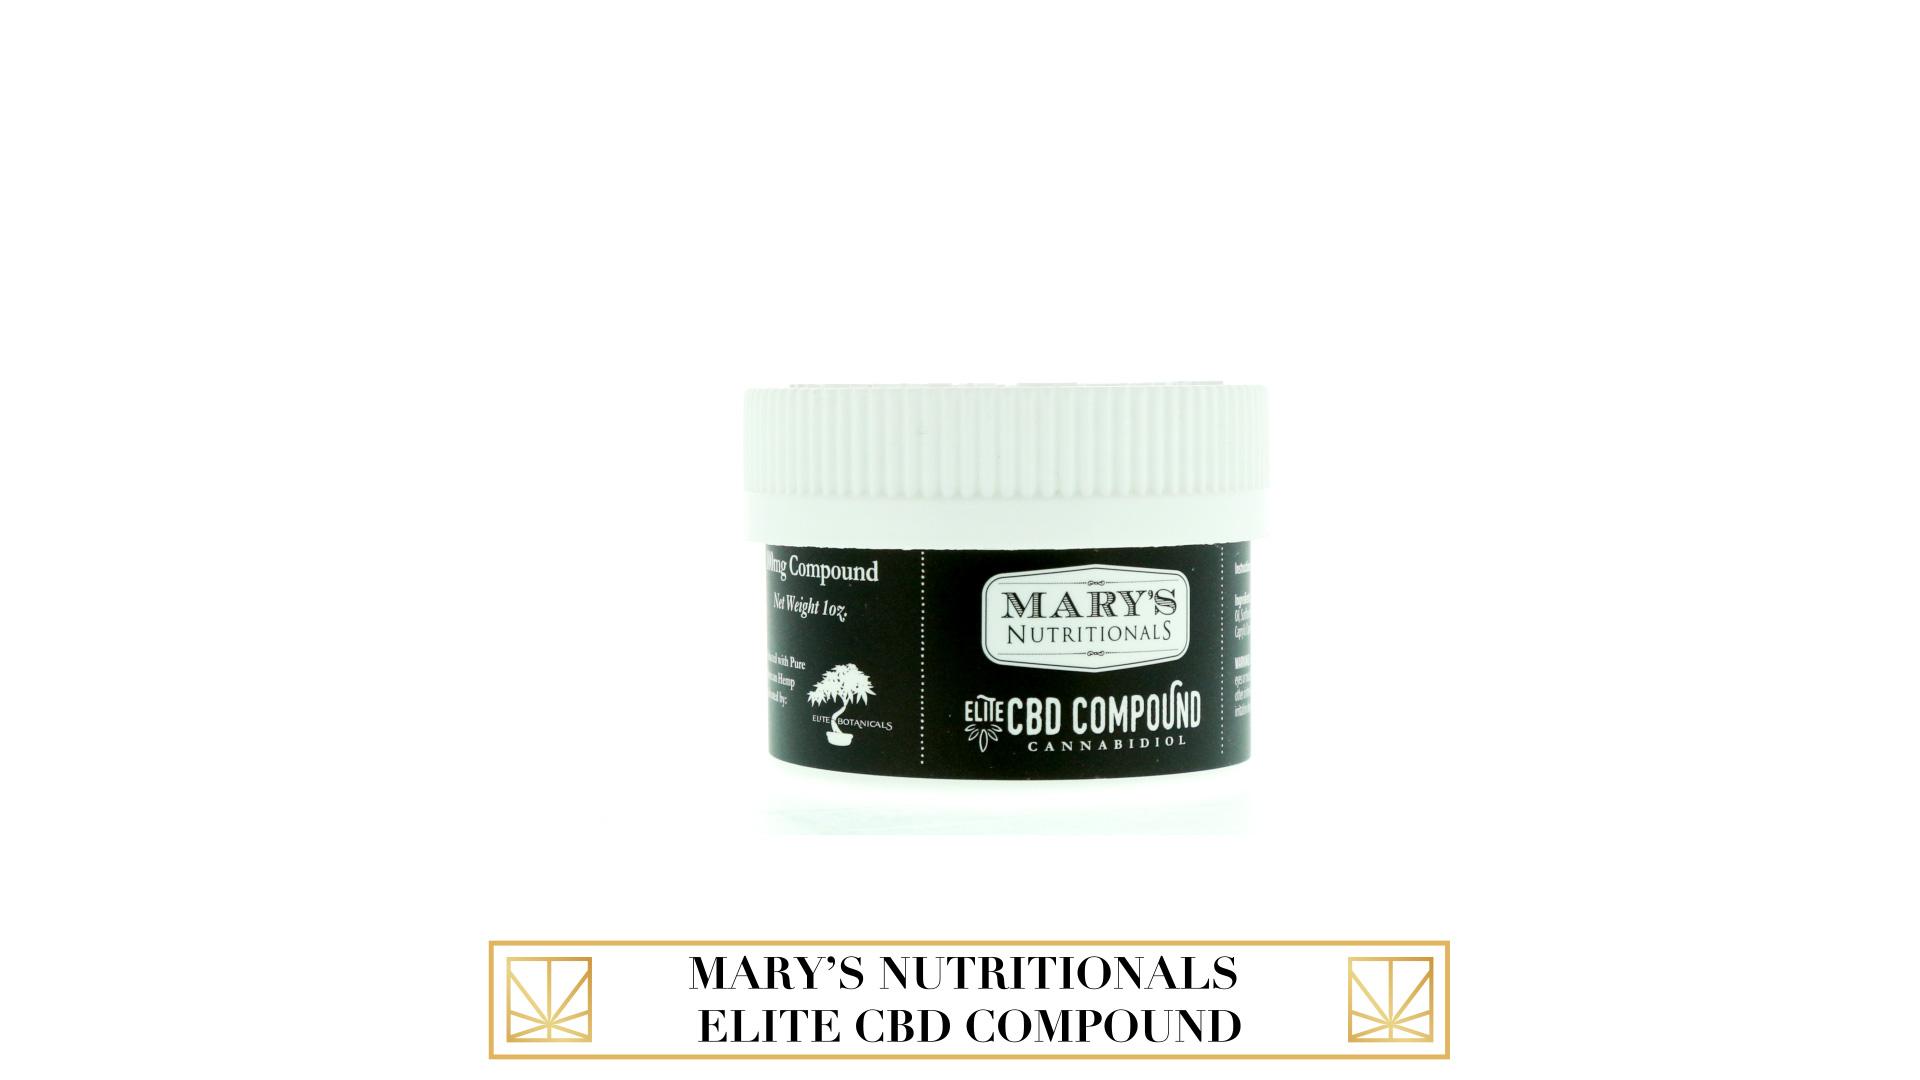 Mary's Nutritionals Elite CBD Compound